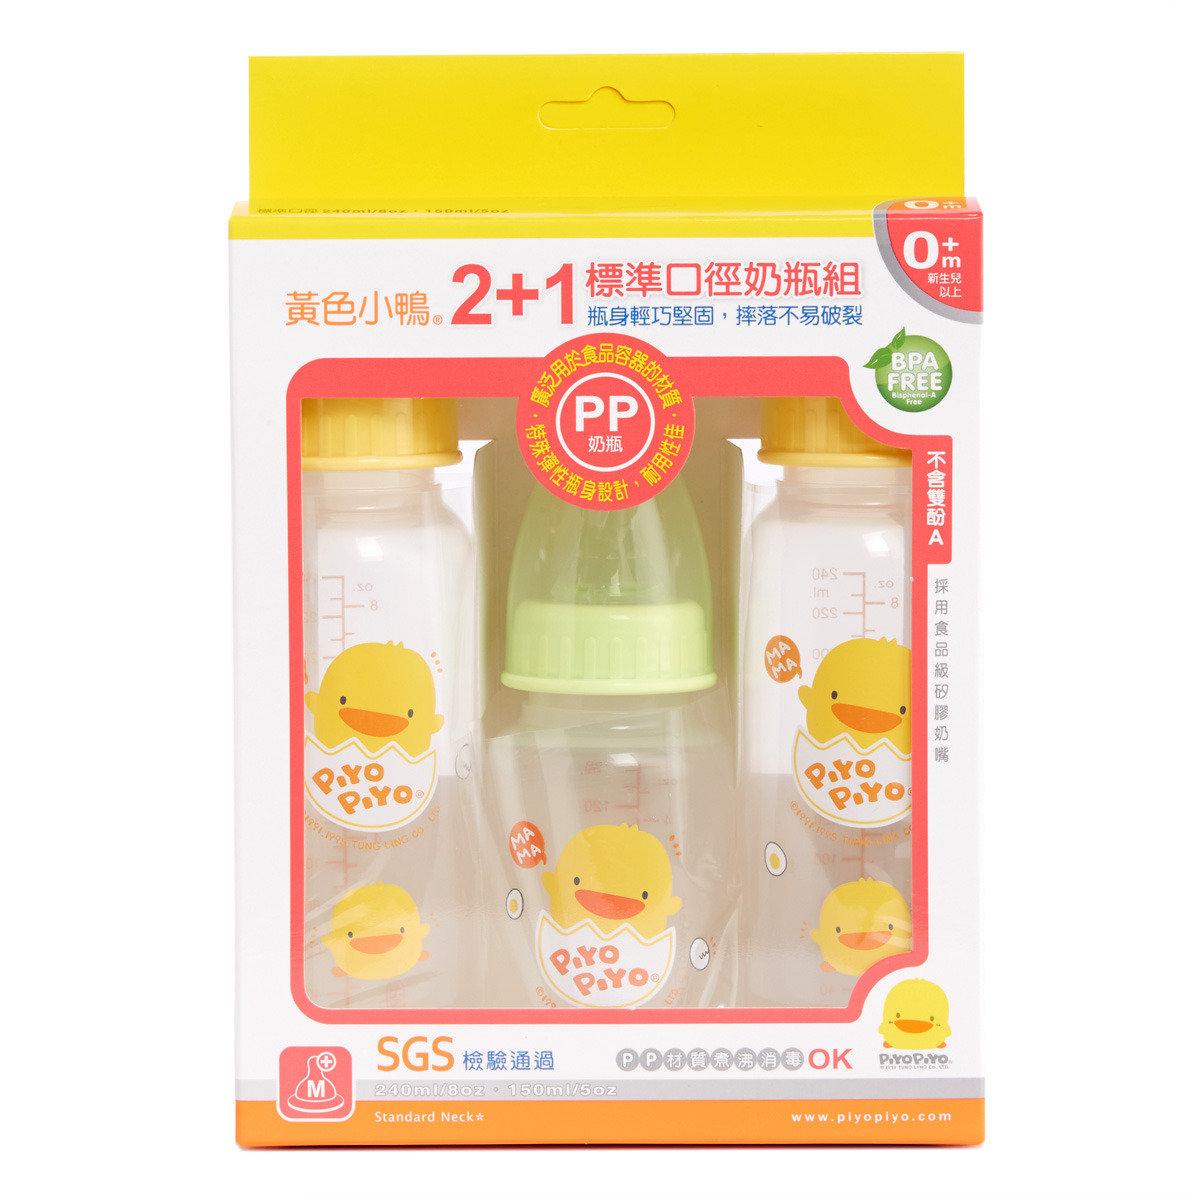 黃色小鴨PP奶瓶 2+1